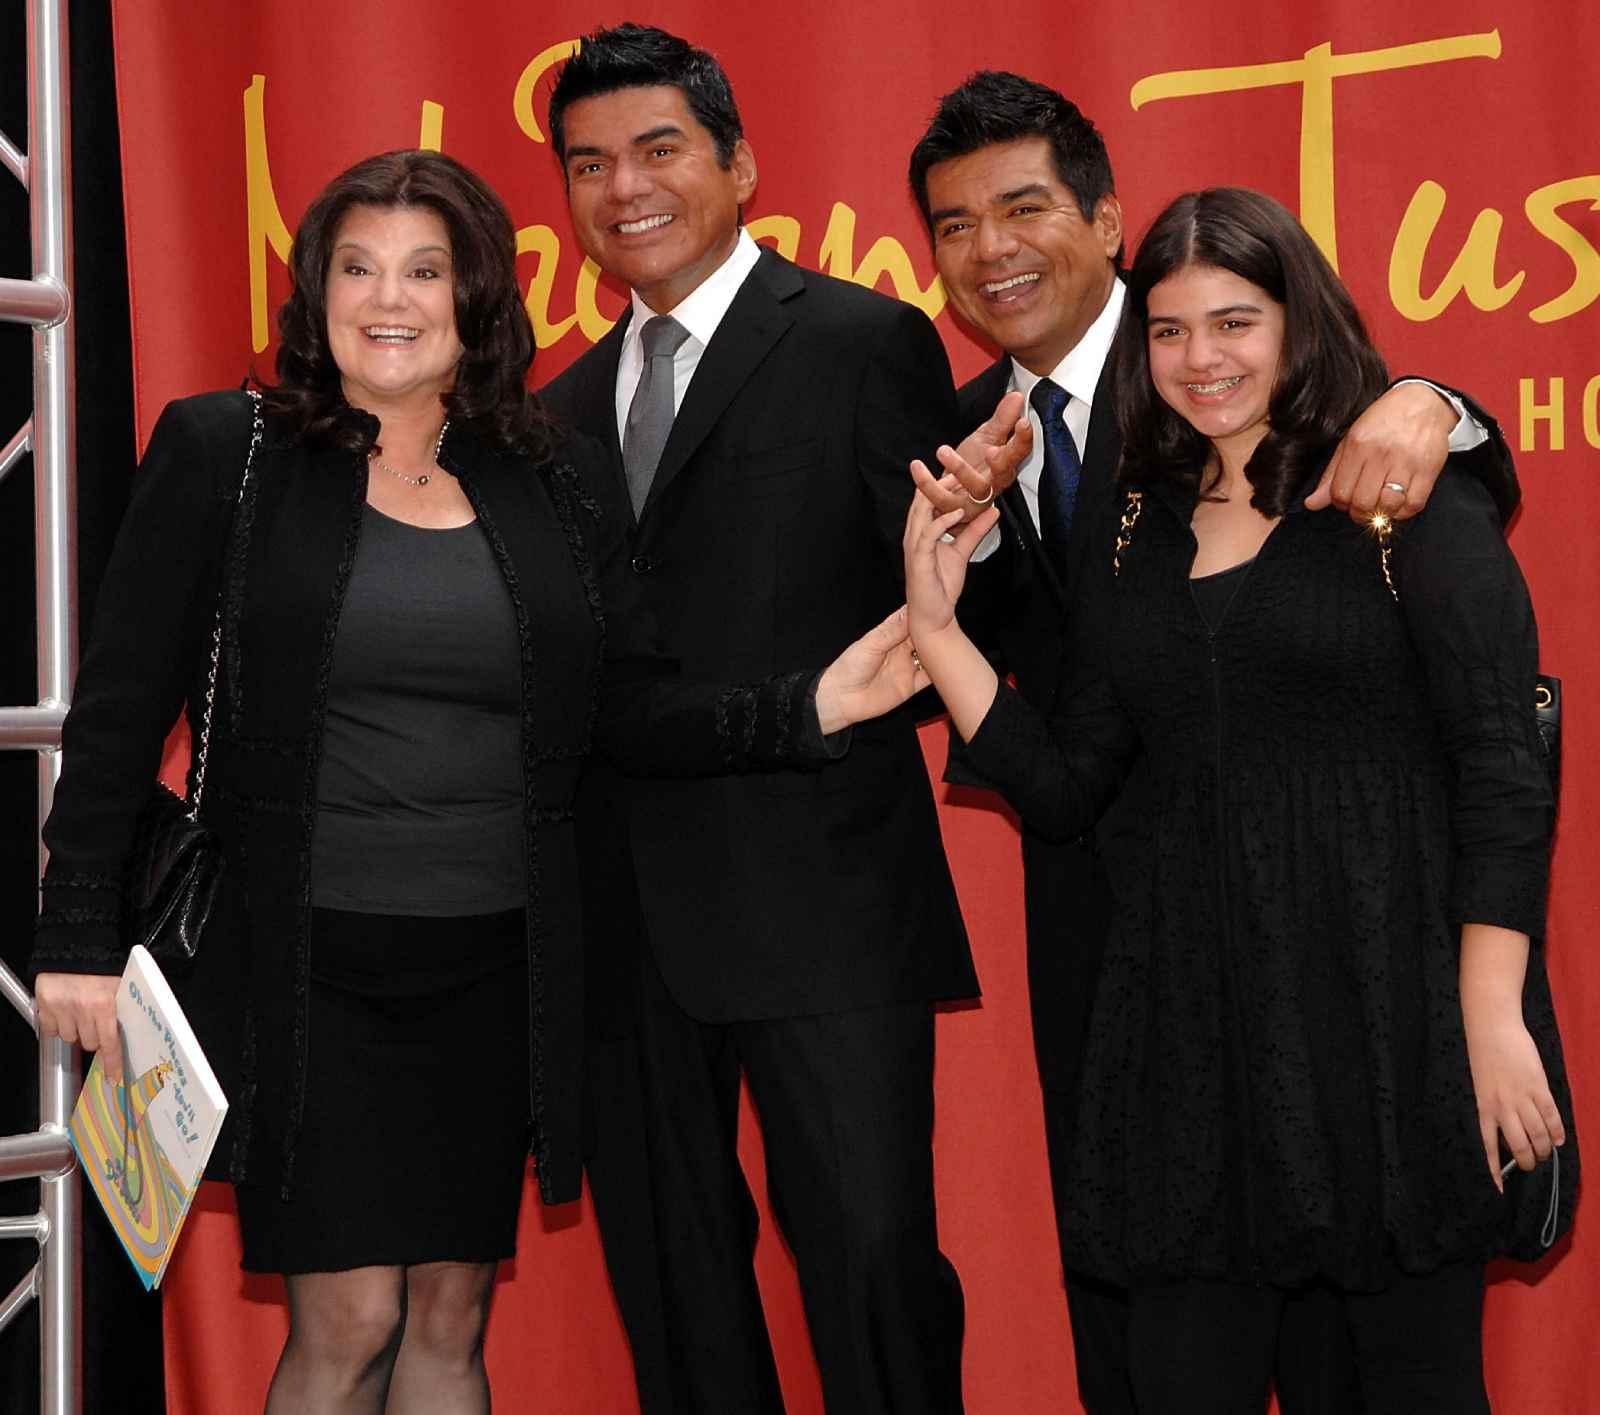 George Lopez, Ann Serrano, Mayan Lopez